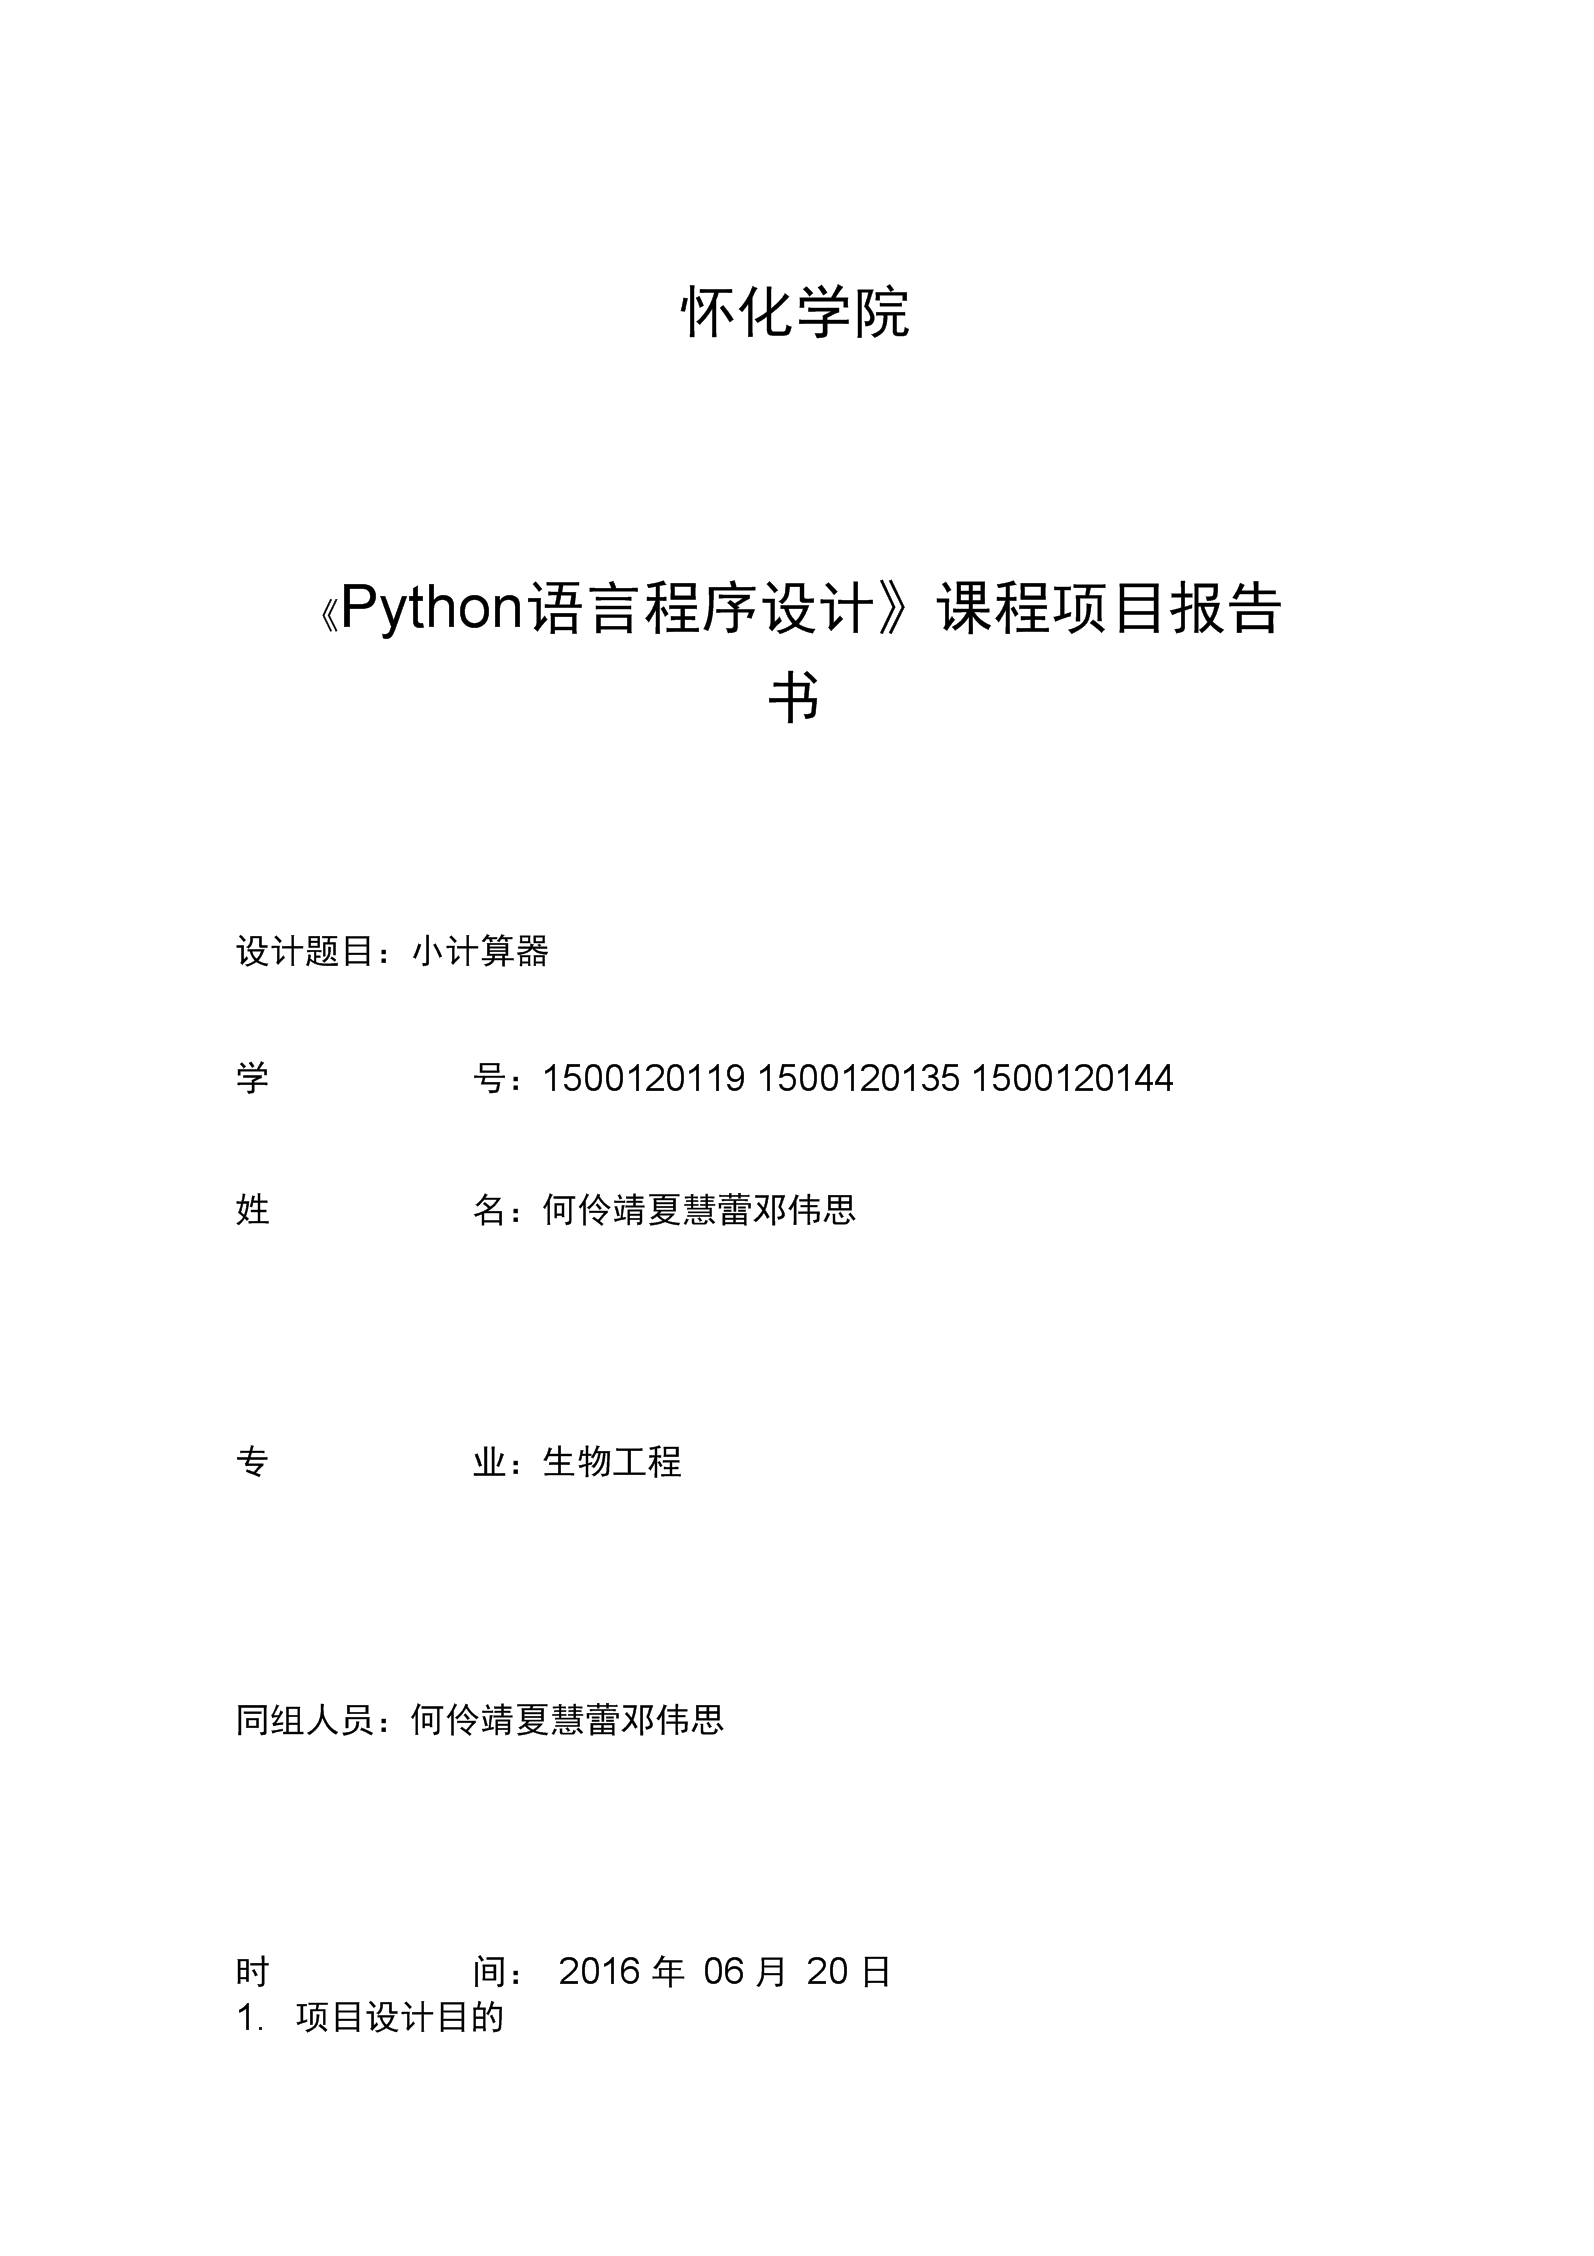 《Python语言程序设计》项目报告书.docx